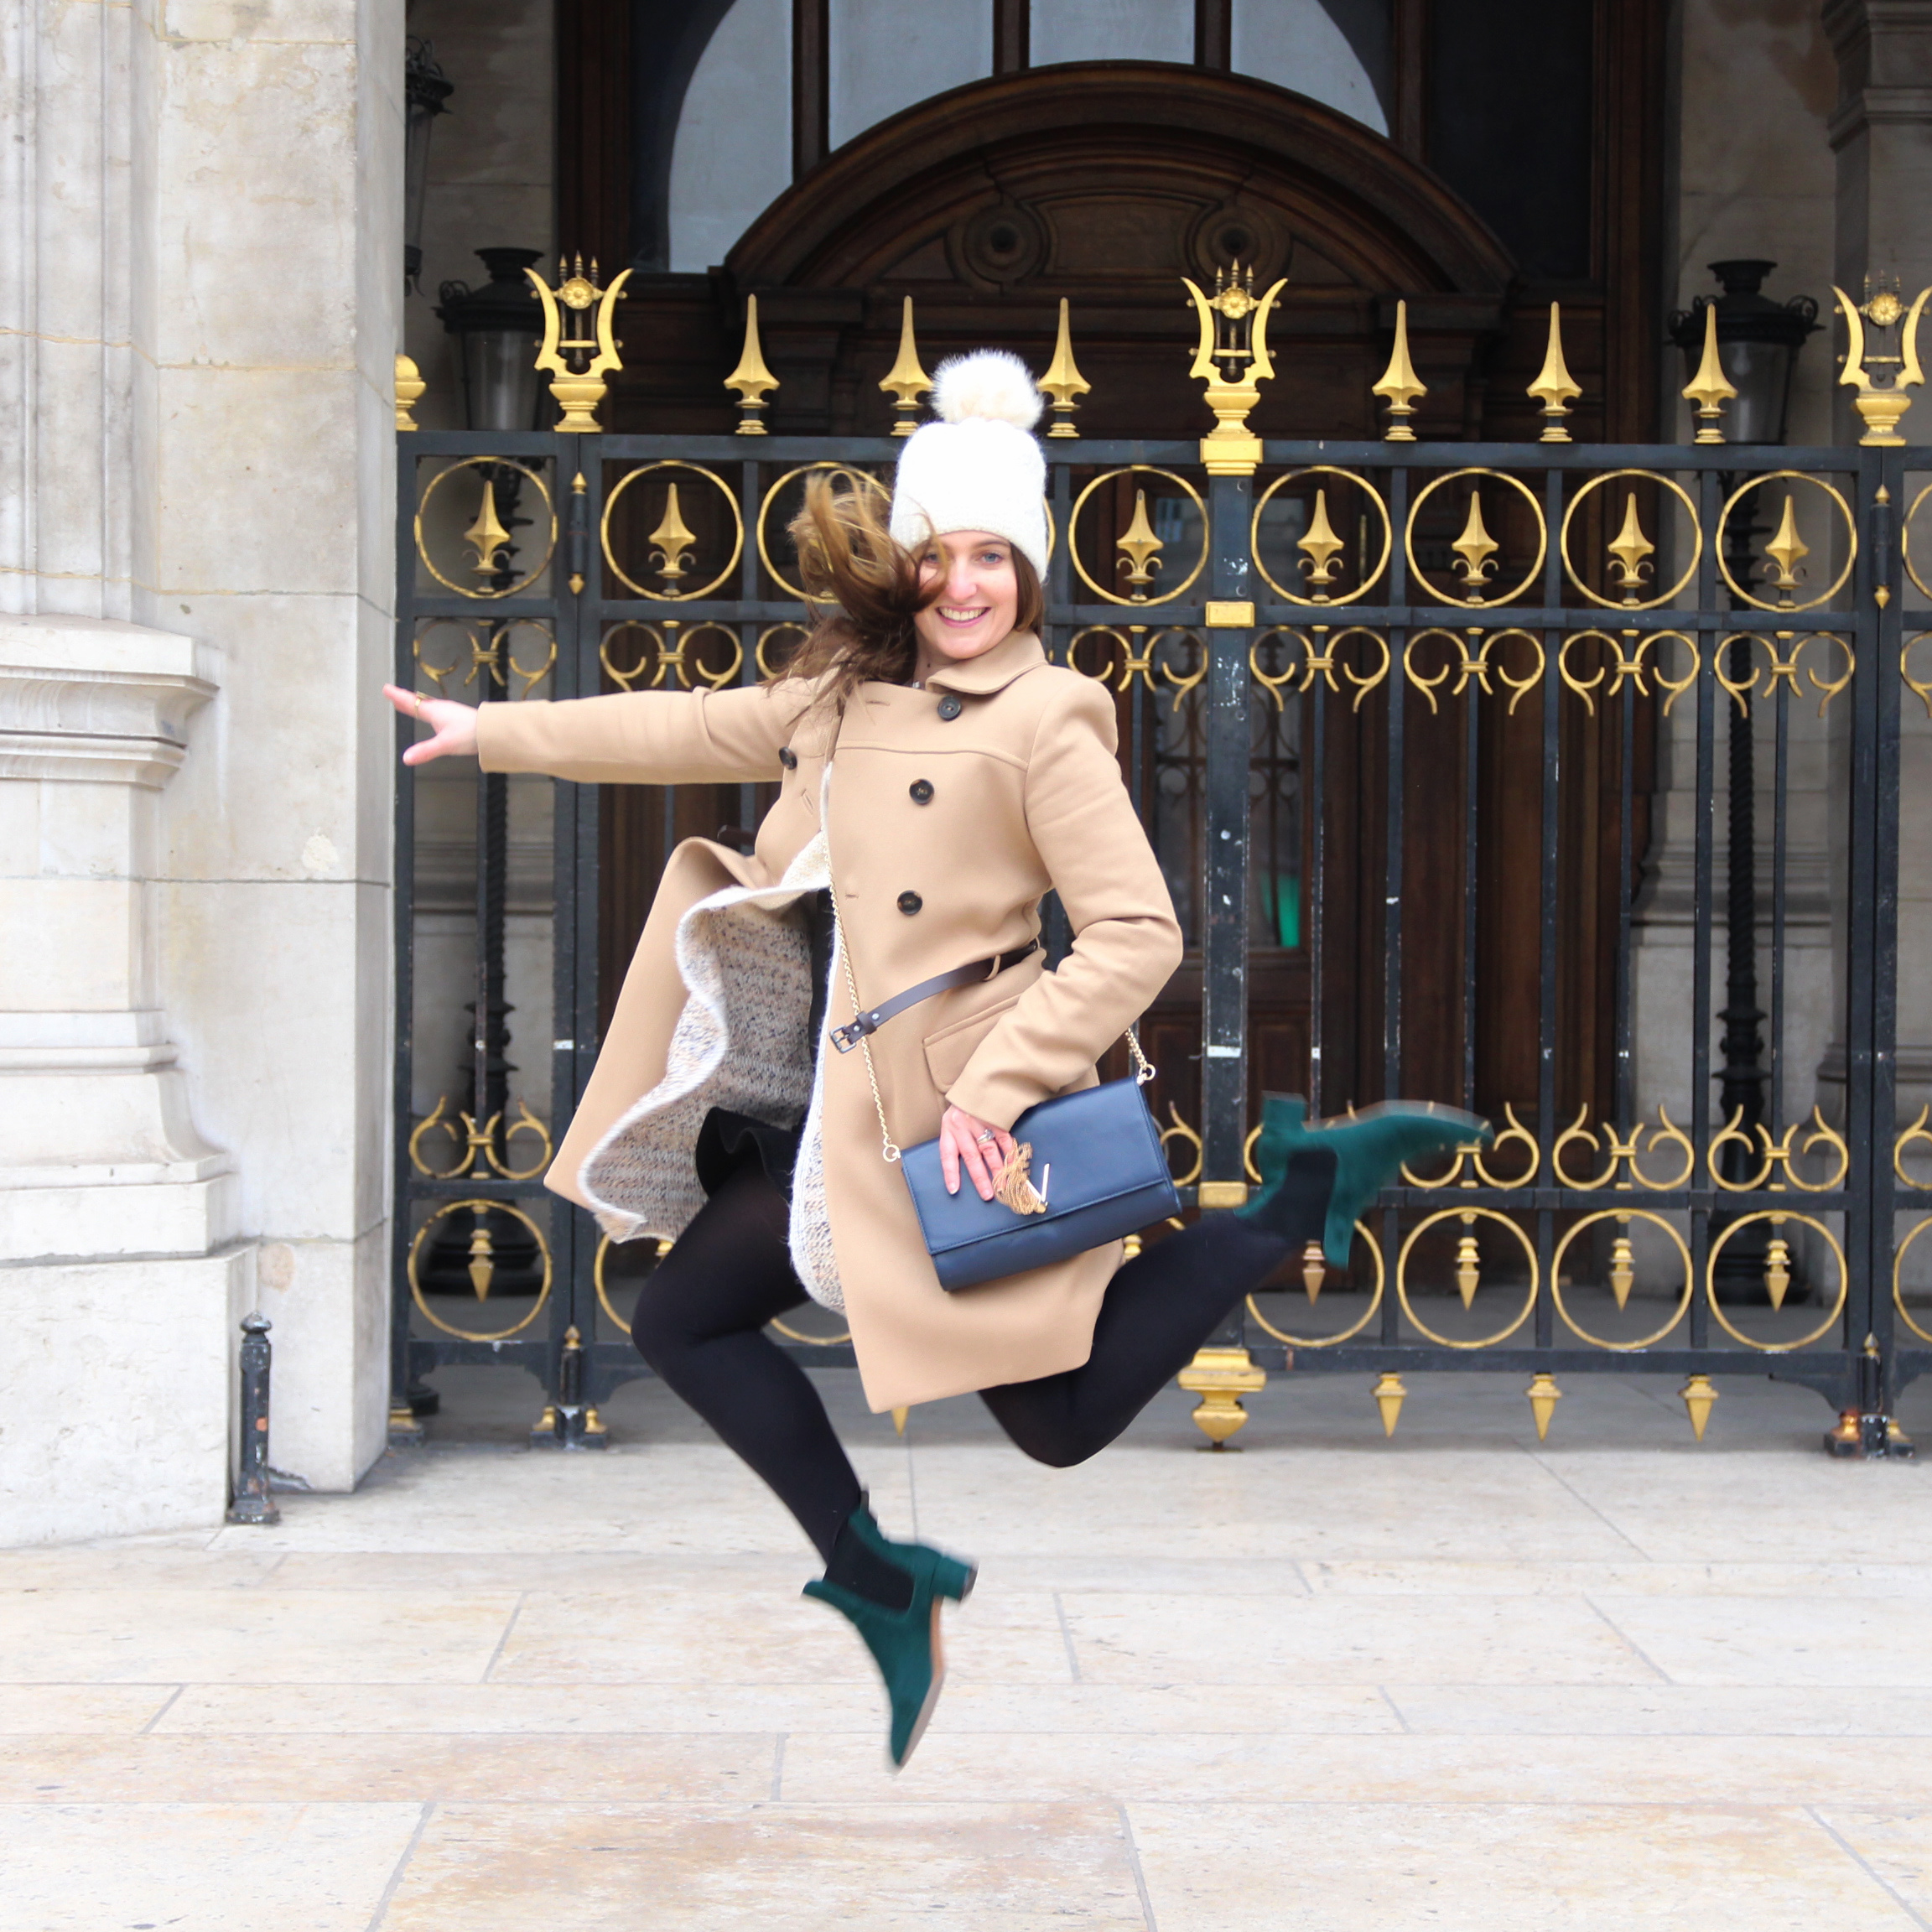 paris-opera-garnier-winter-day-influencer-style-personalstylist-imageconsultant-seralynepointcom-img_6685